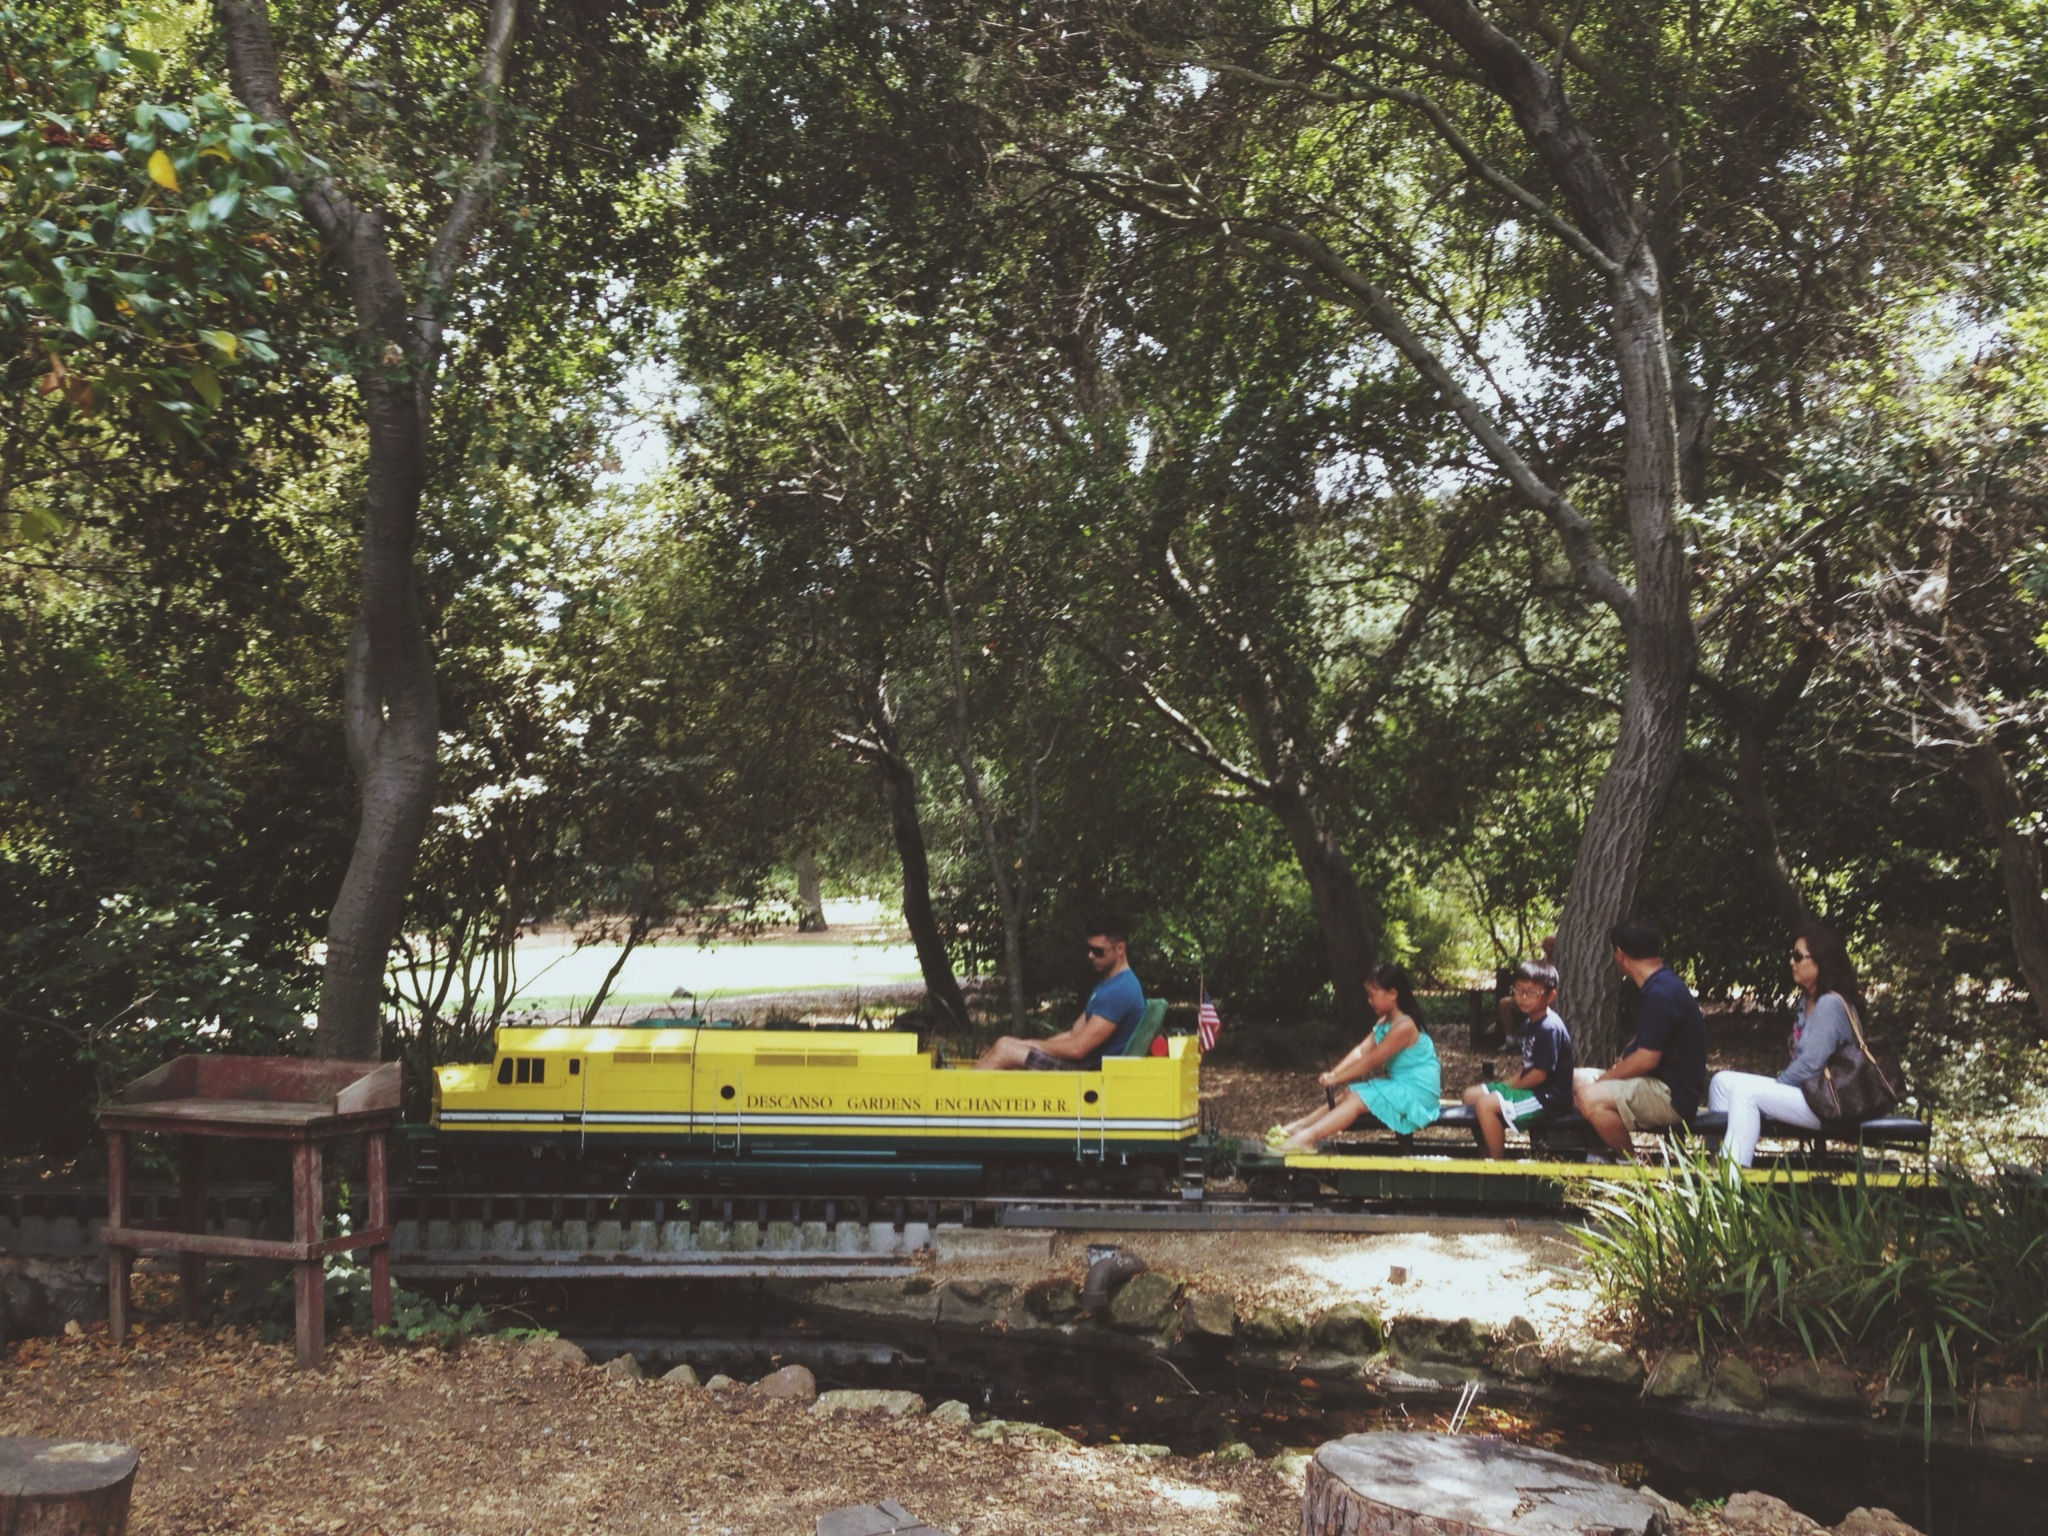 ART OF TRANSIT: Visitors take a ride at Descano Gardens in La Canada-Flintridge on Saturday. Photo by Steve Hymon/Metro.